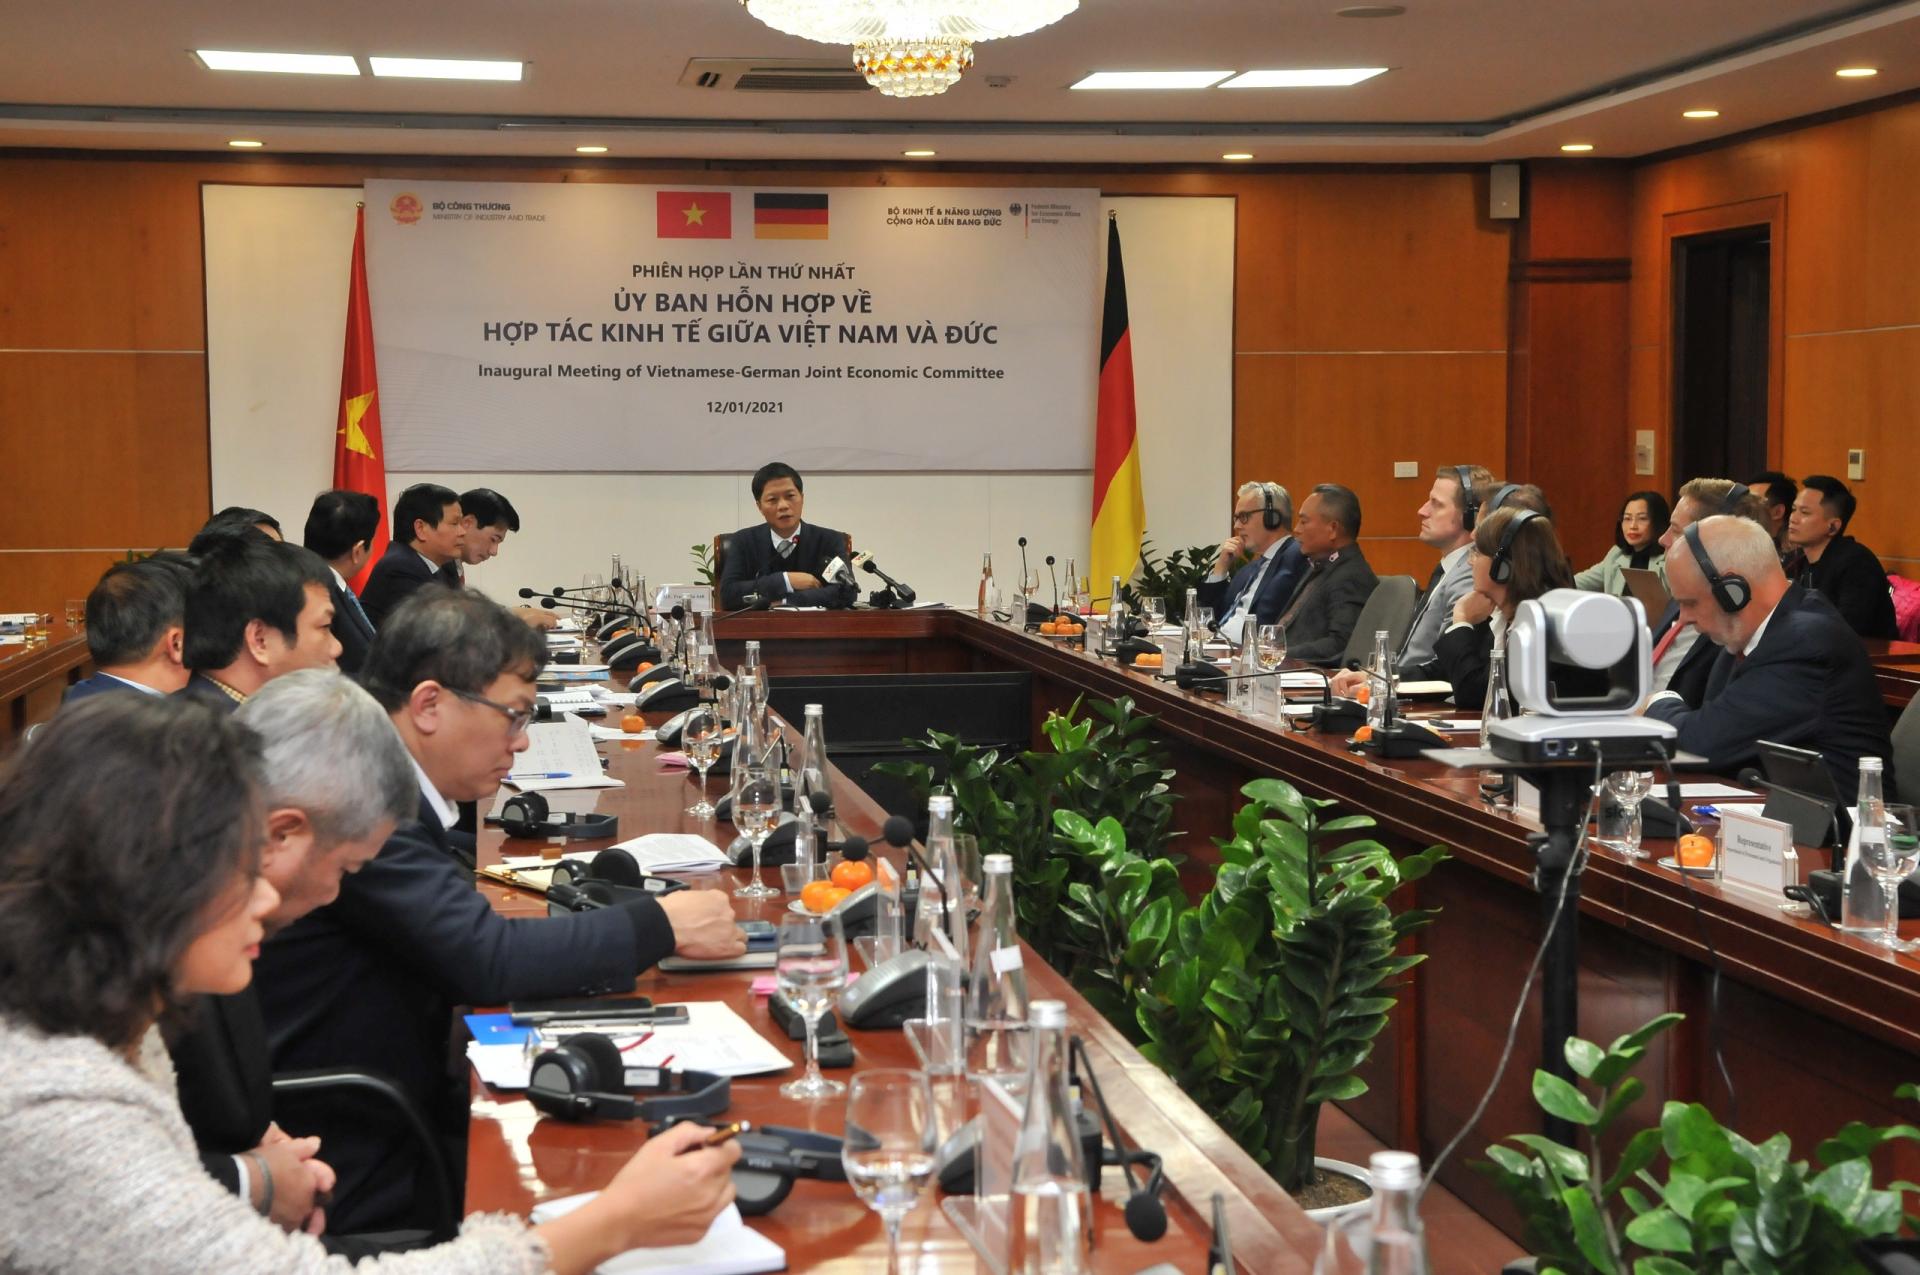 vietnam germany beef up economic links